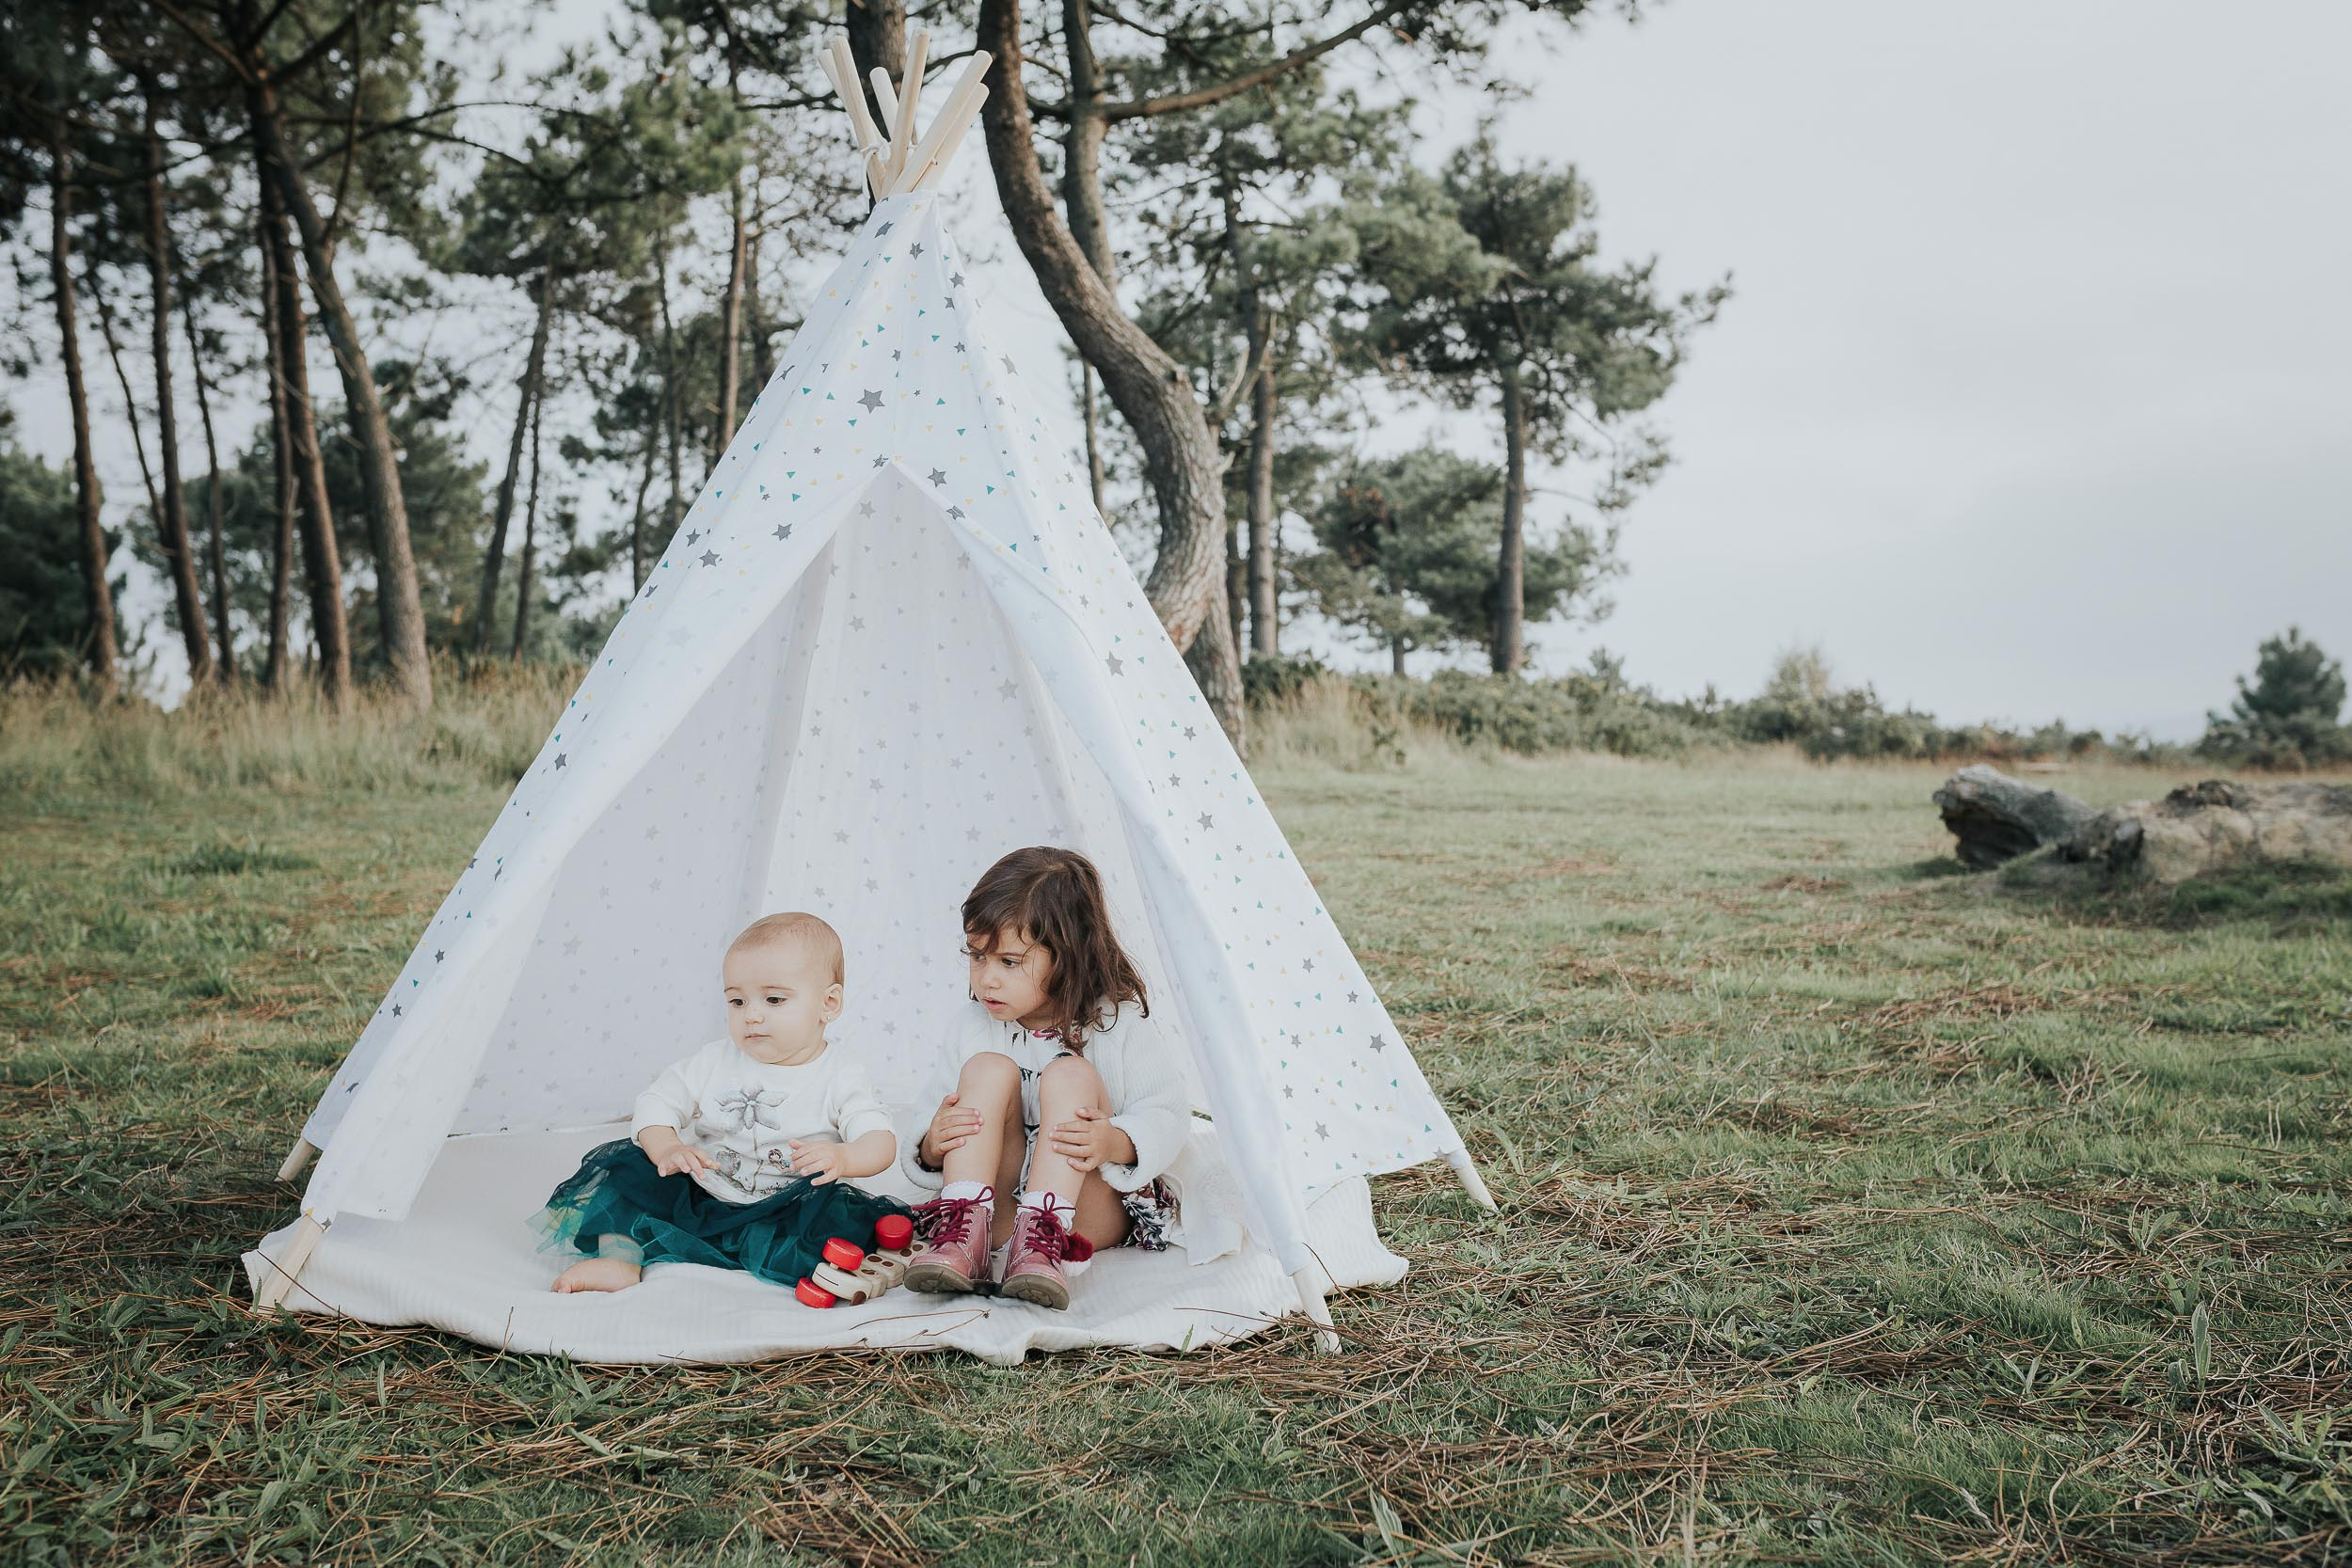 Sesión infantil realizada por en fotografo infantil Johanna Arias Fotografo en Asturias